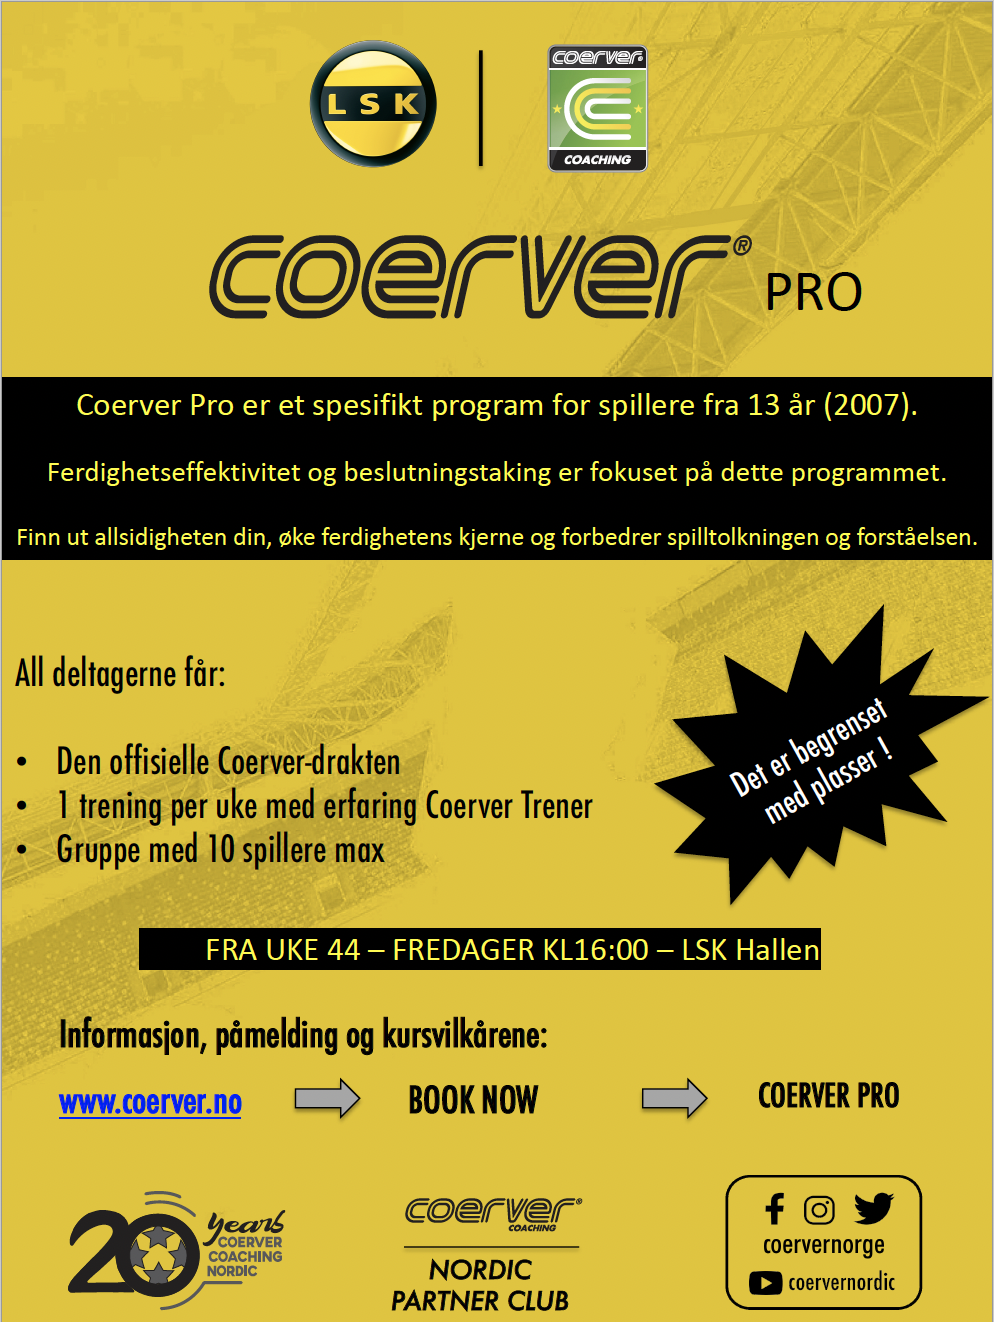 Coerver Pro i LSK (off season)